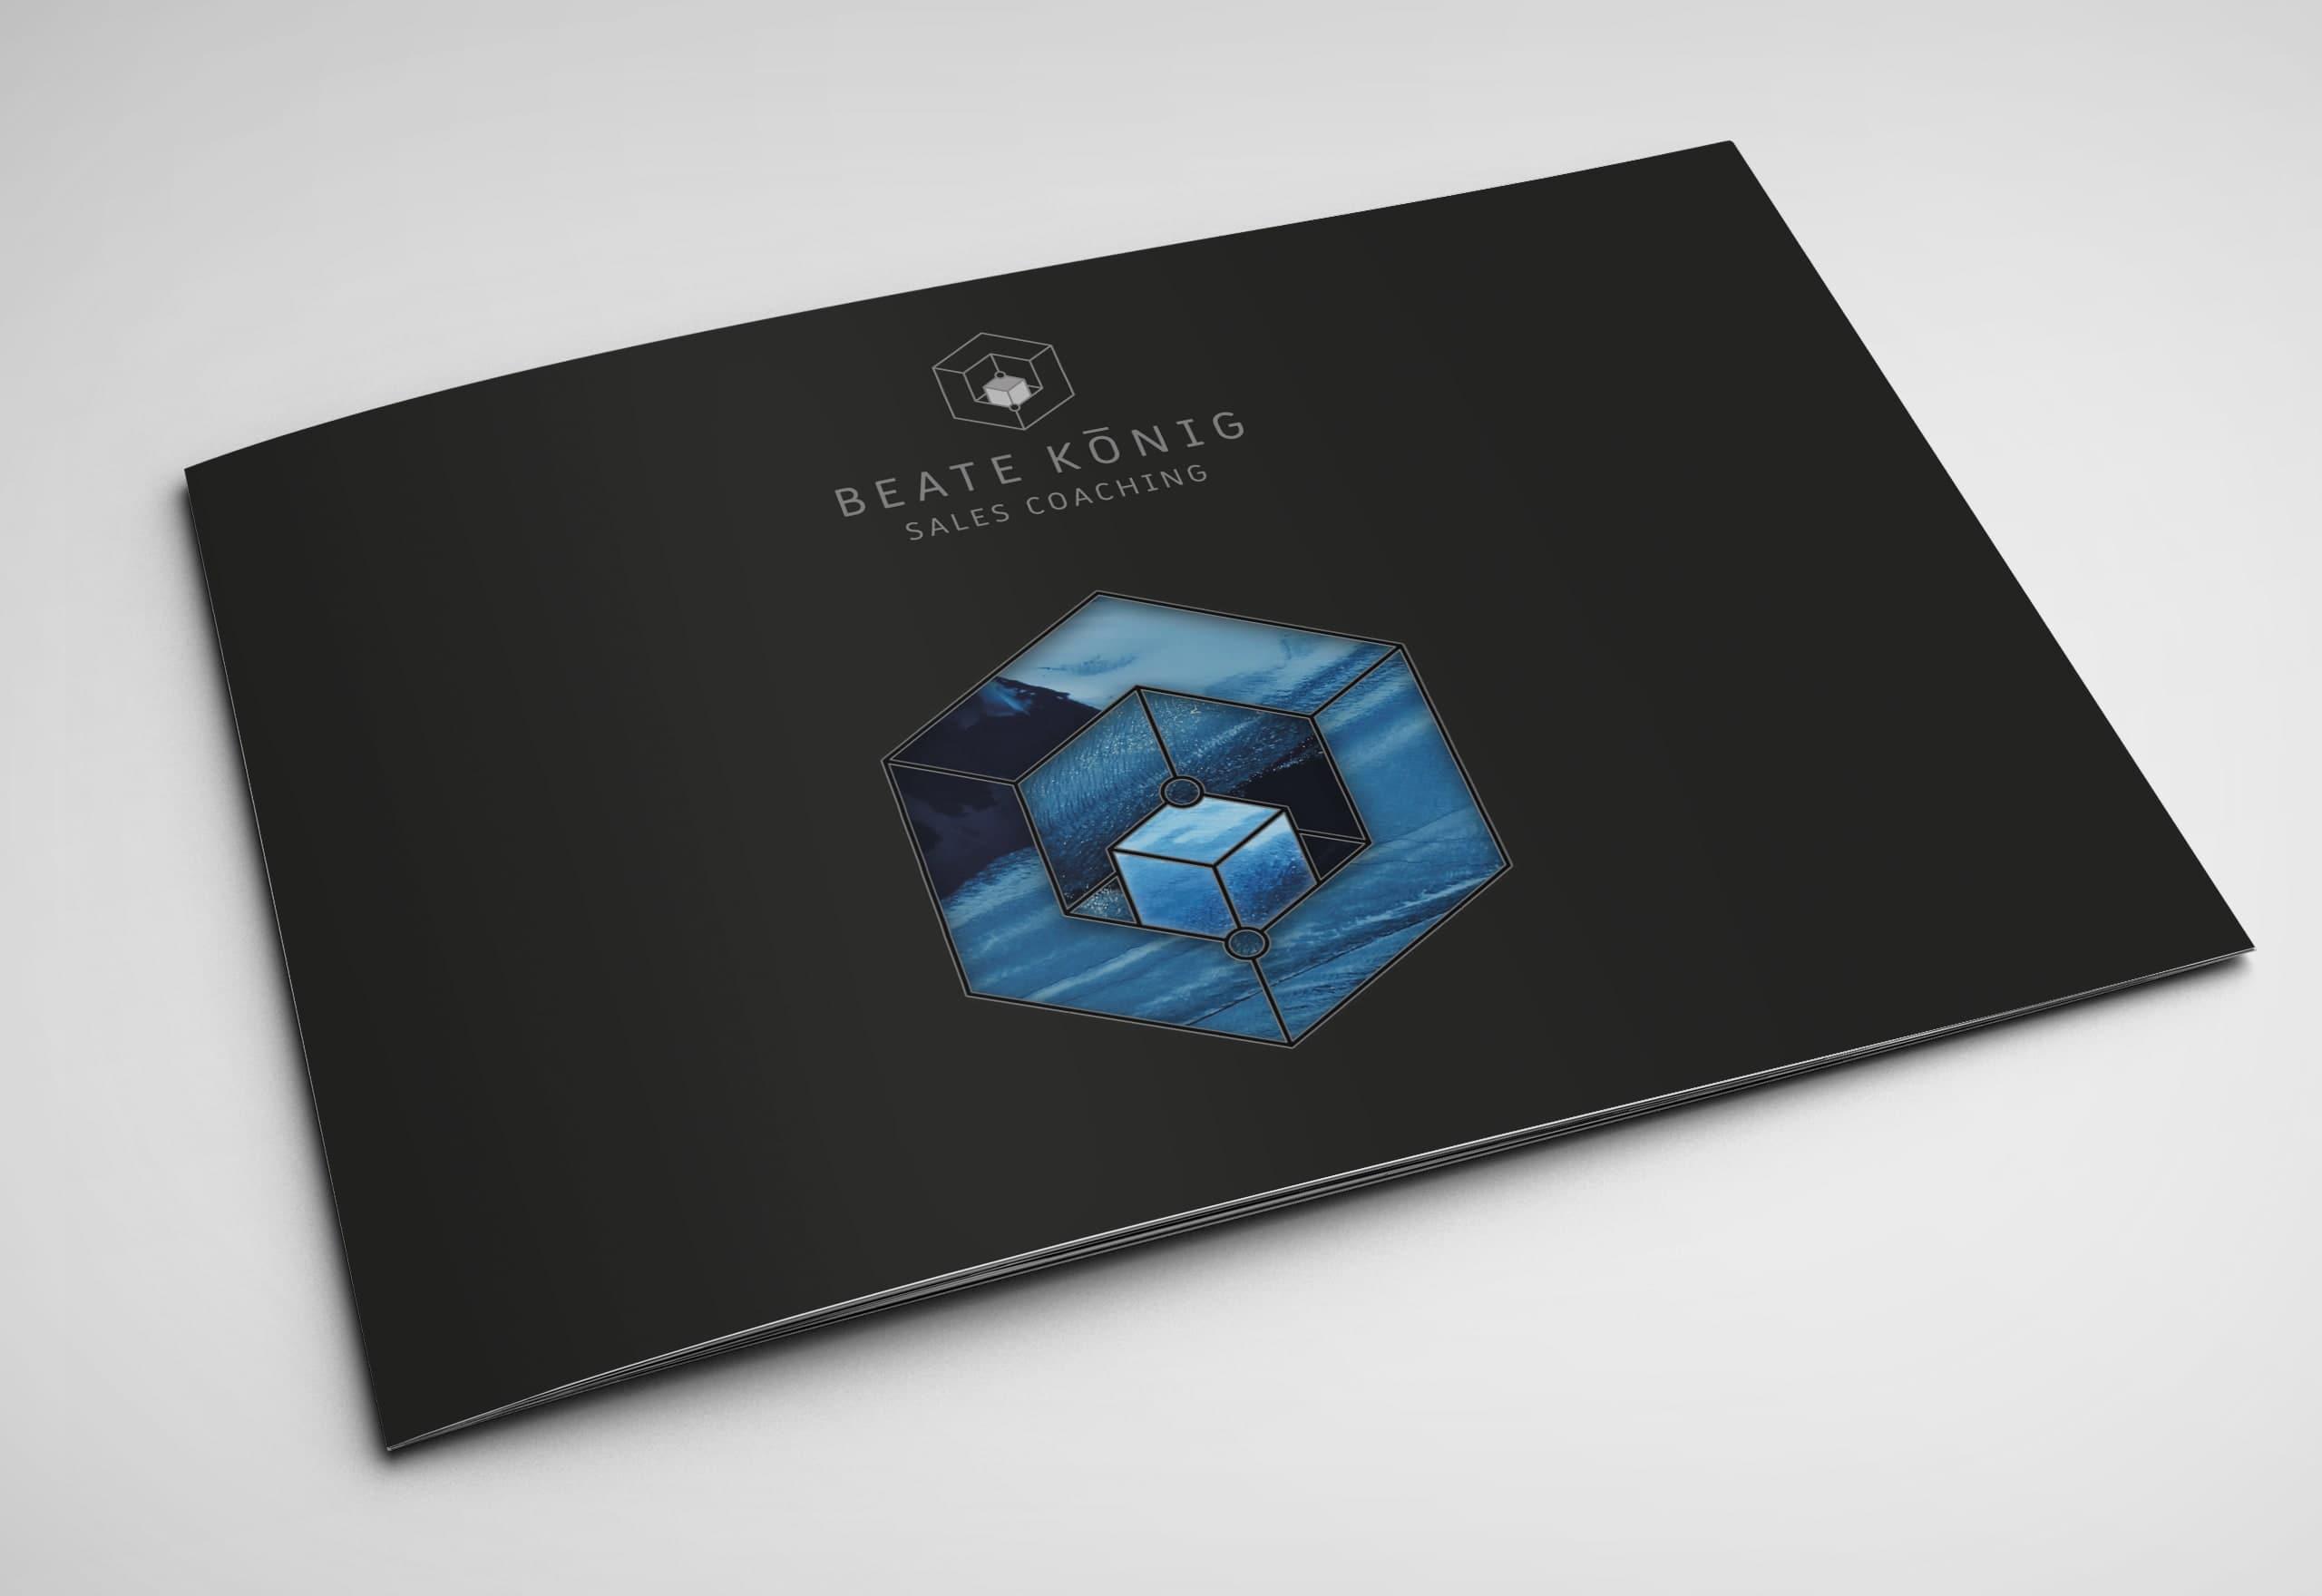 Design Beate König – Sales Coaching